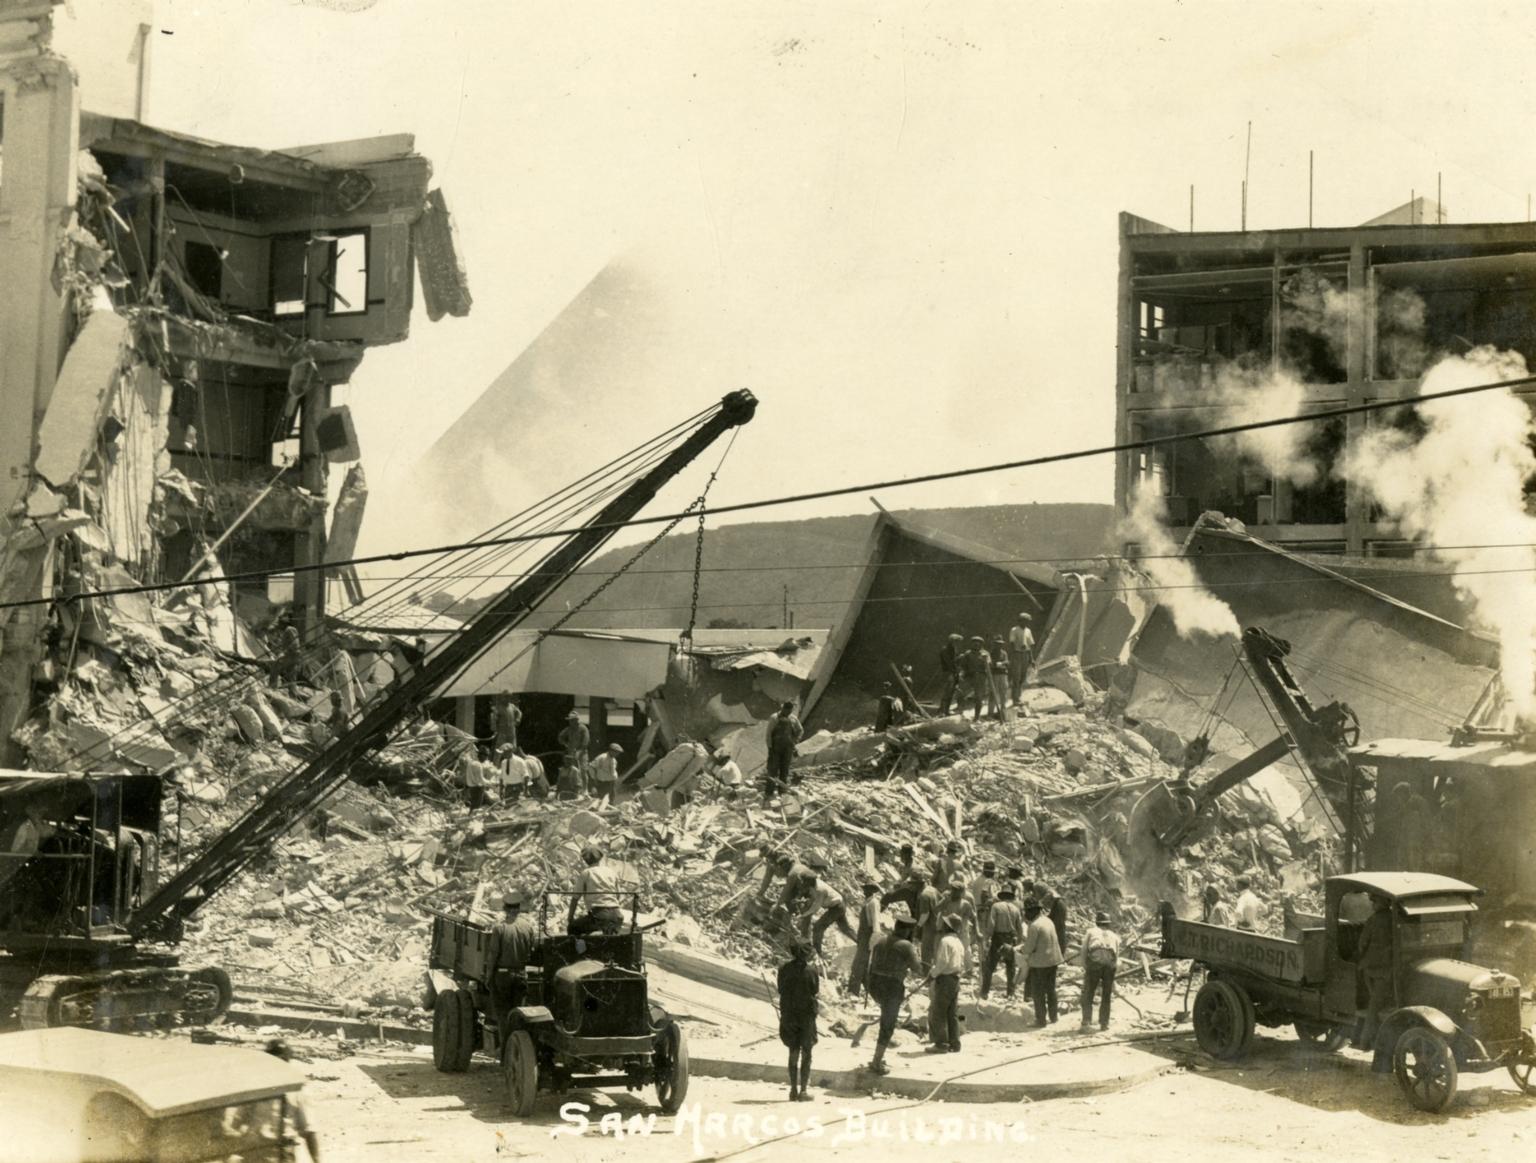 Santa Barbara 1925 Earthquake Damage - San Marcos Building